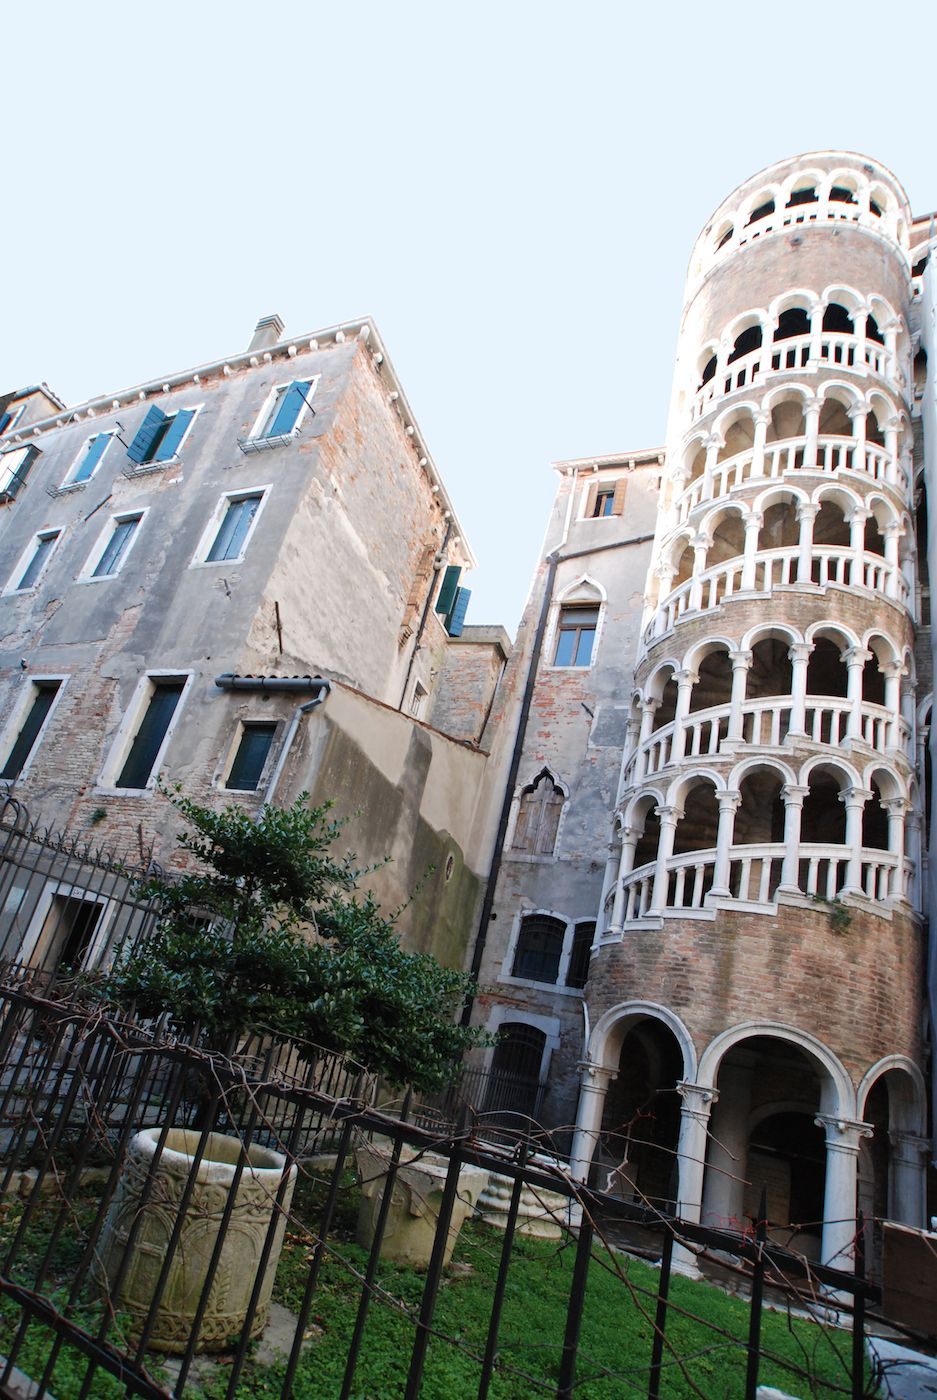 the entrance to the Bellini is next to Scala Contarini Del Bovolo